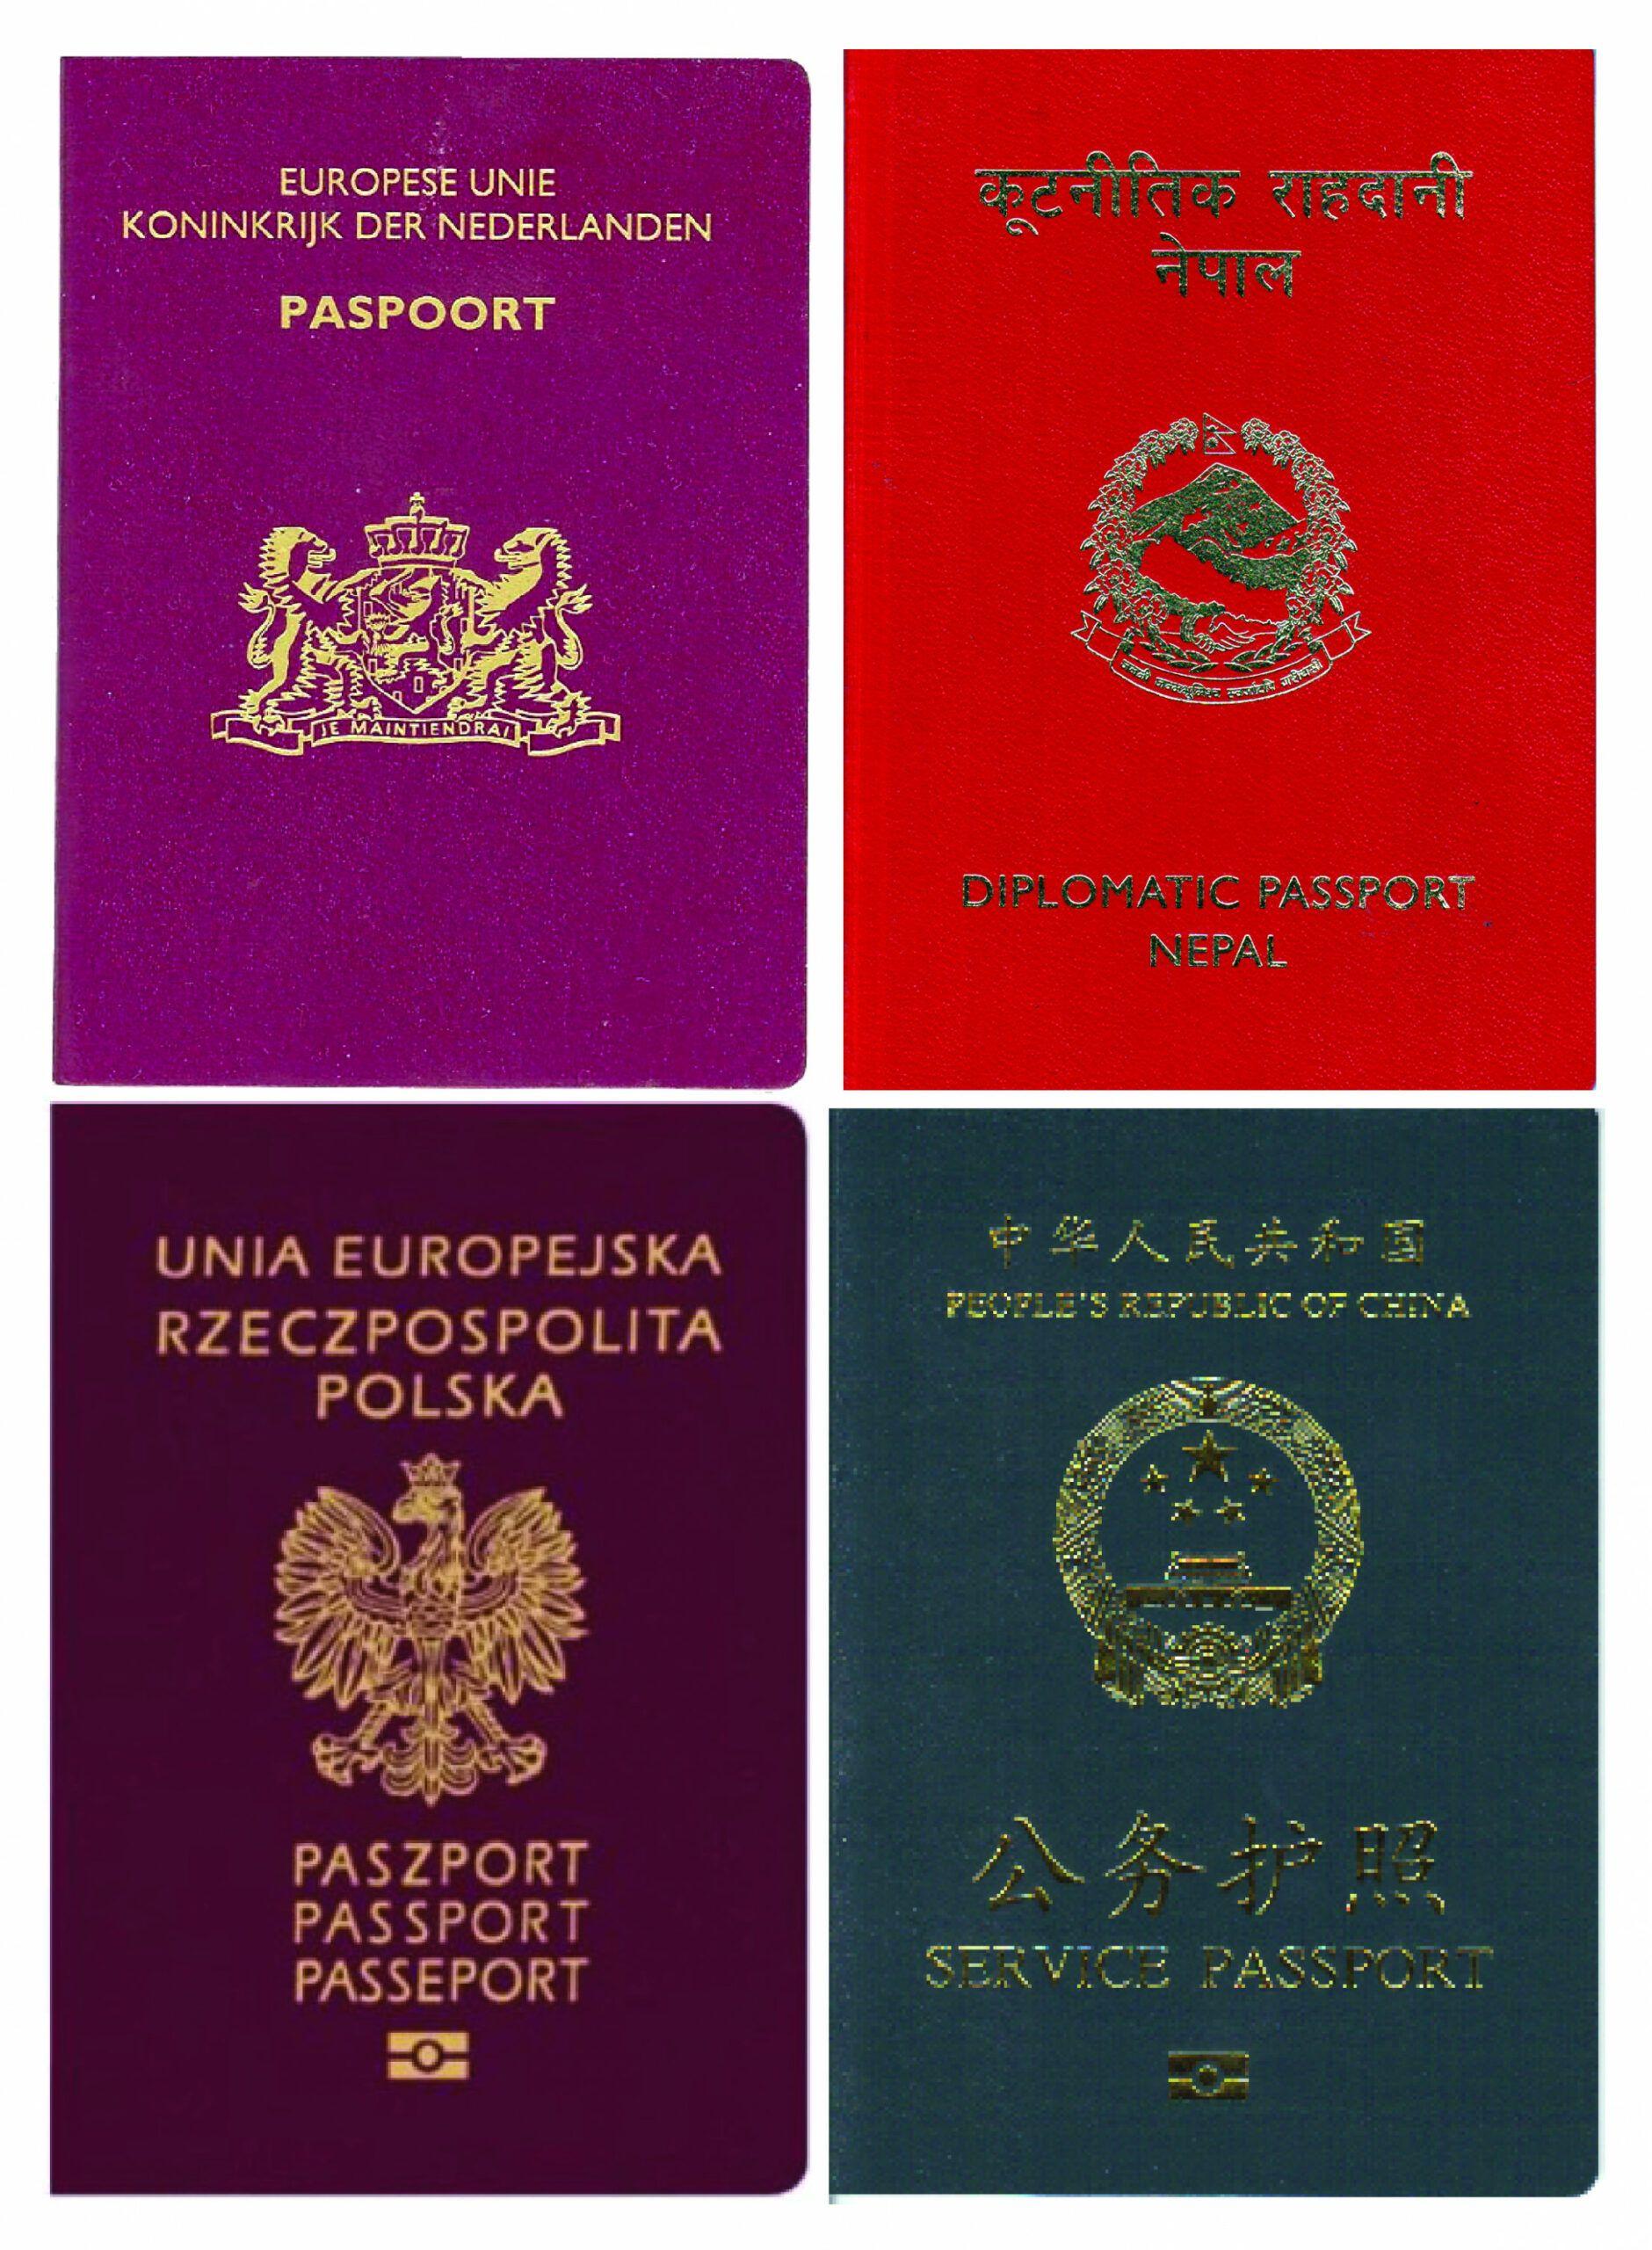 10 Border Crossing Card History The Supreme Cloister Said Monday